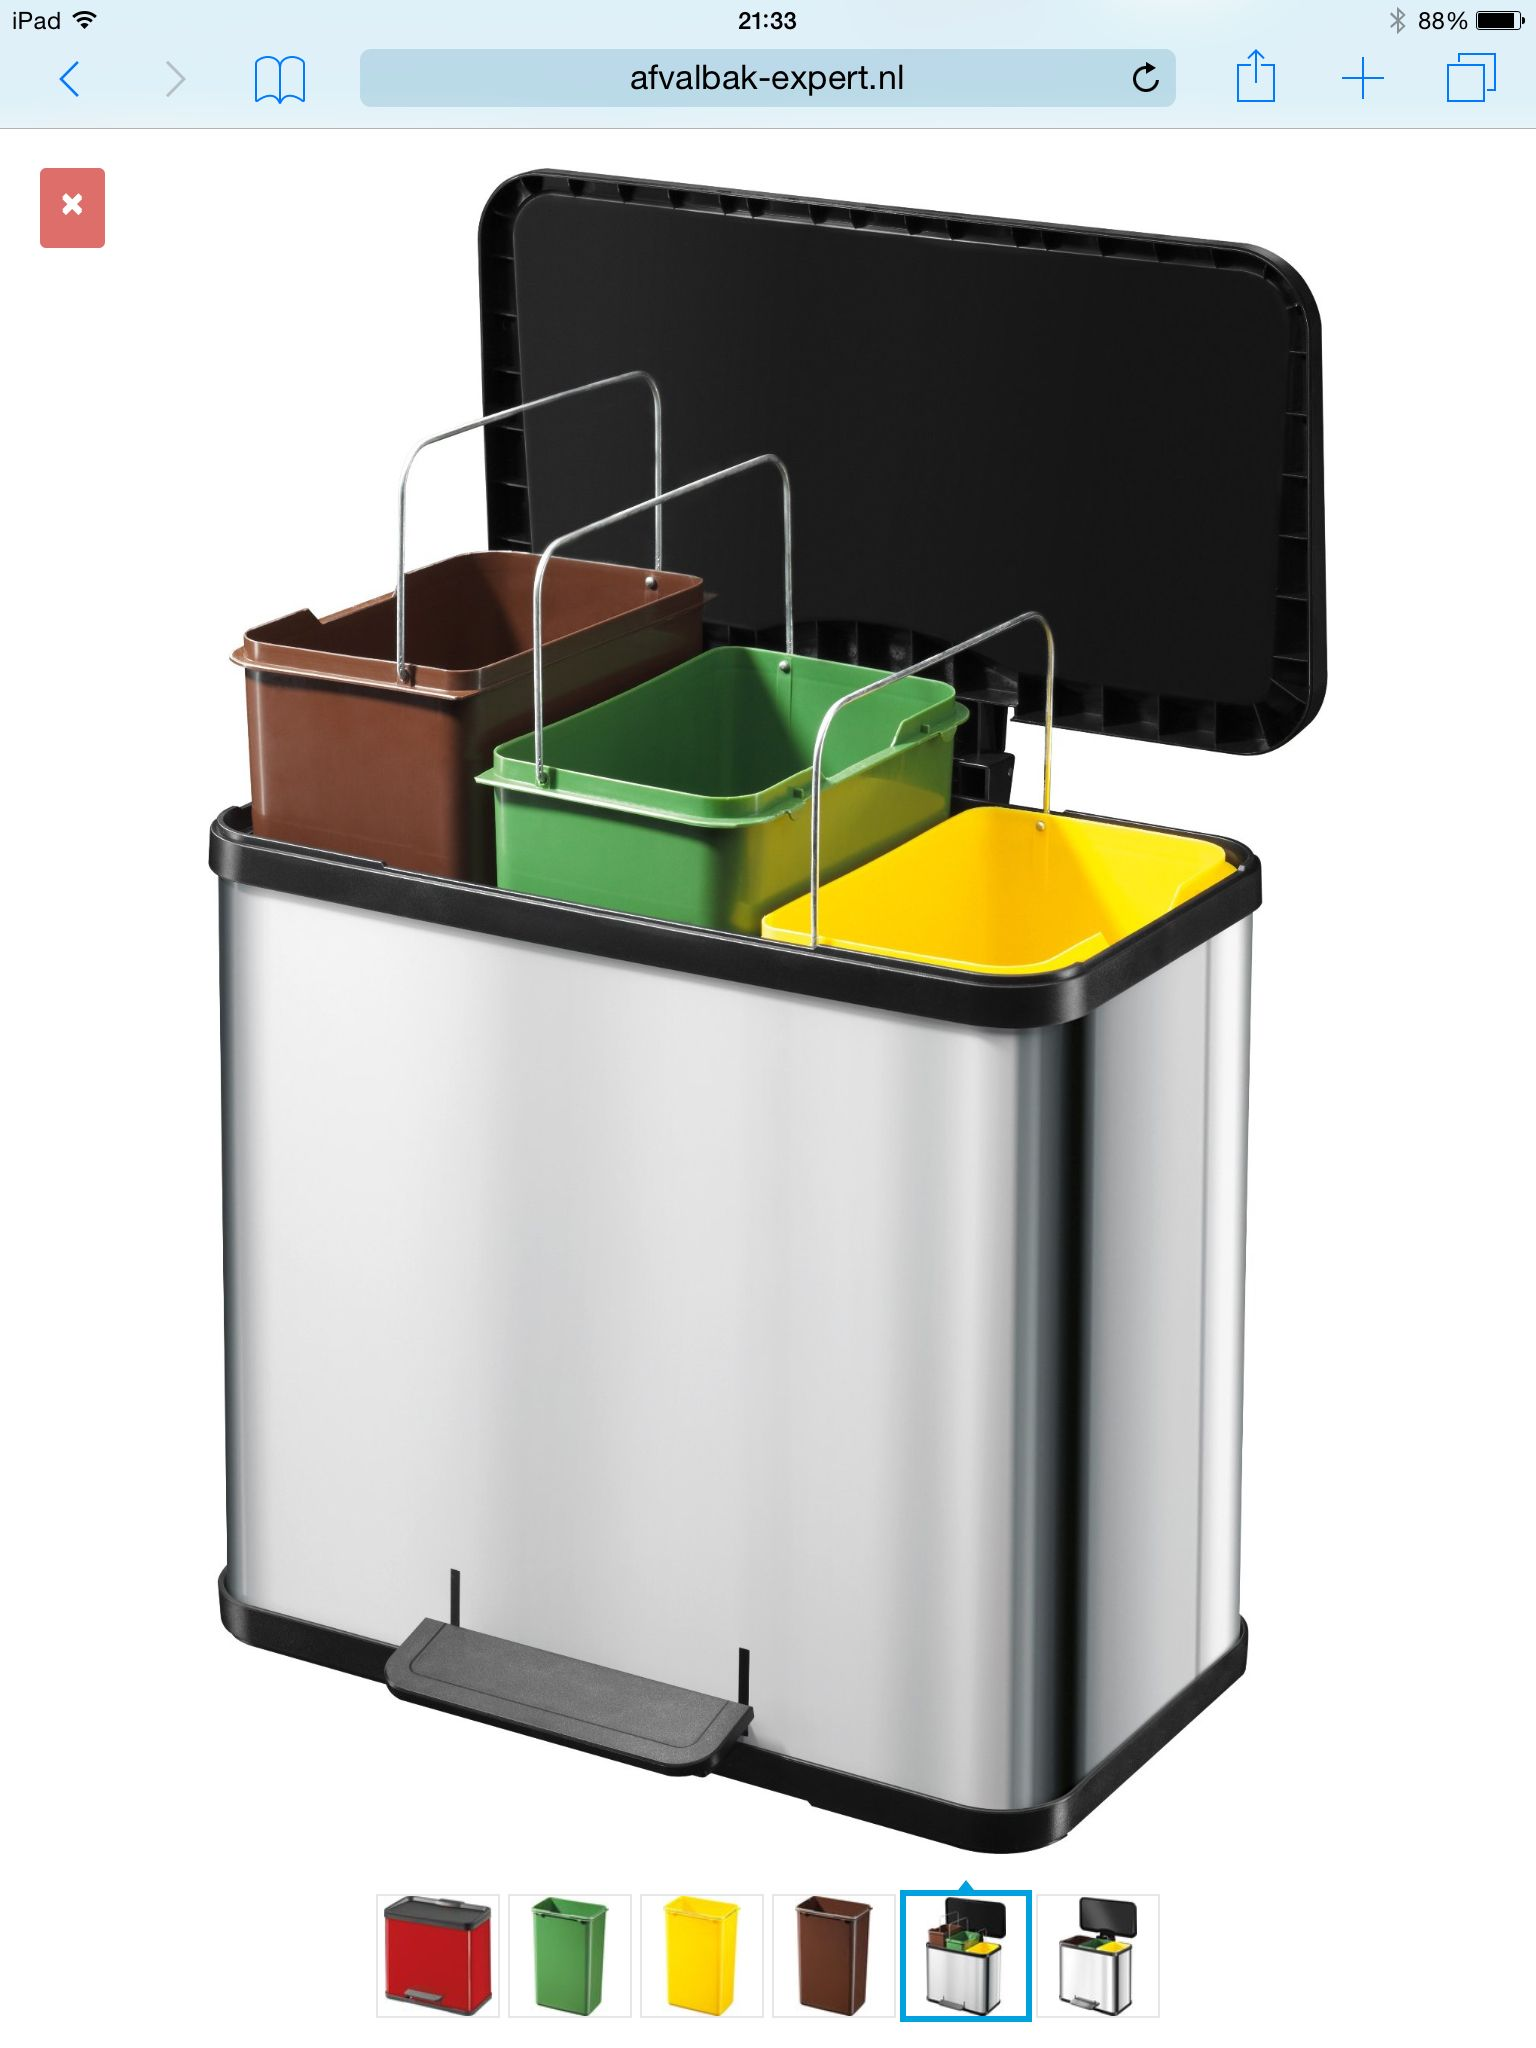 Haiko 3 Delige Afvalbak Voor Keuken Decor Kitchen